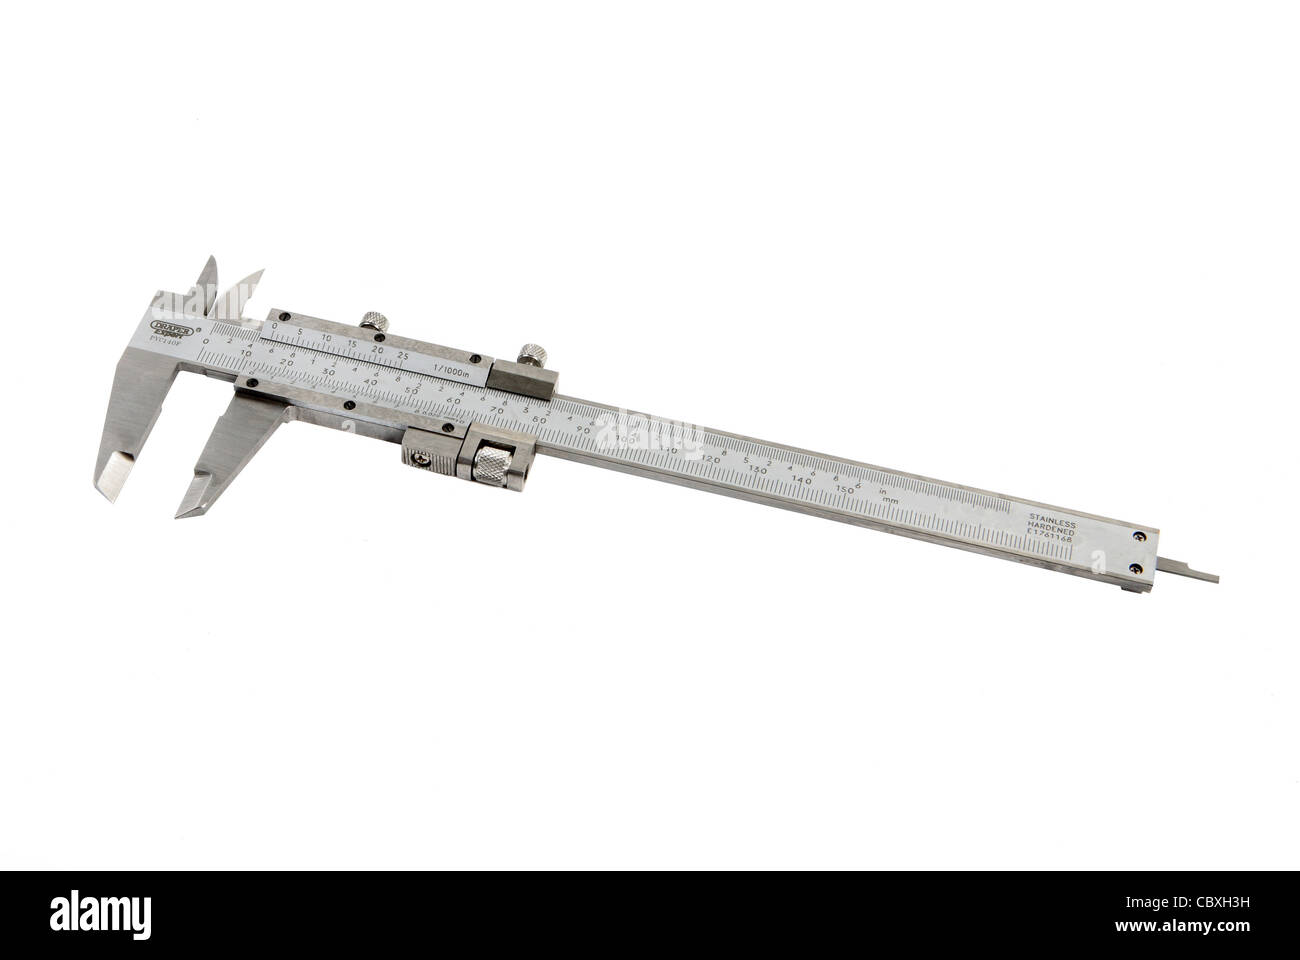 Vernier caliper measurement - Stock Image